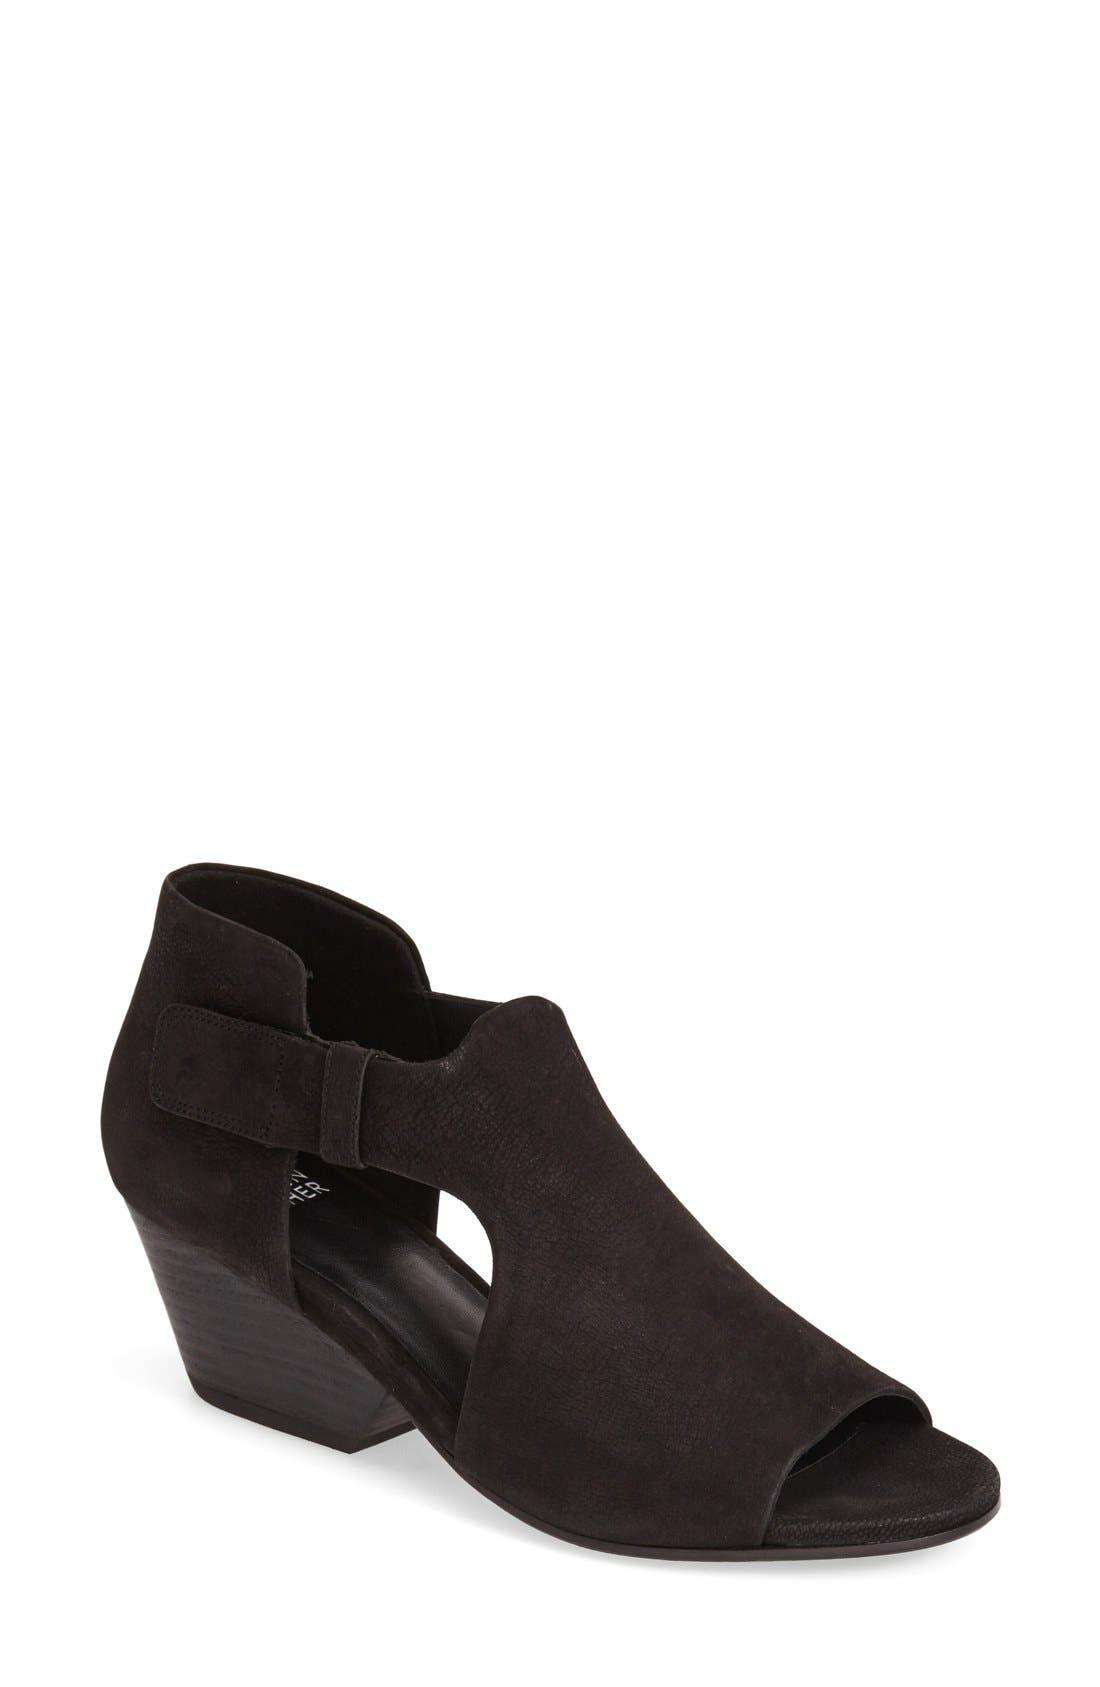 'Iris' Sandal,                         Main,                         color, 001